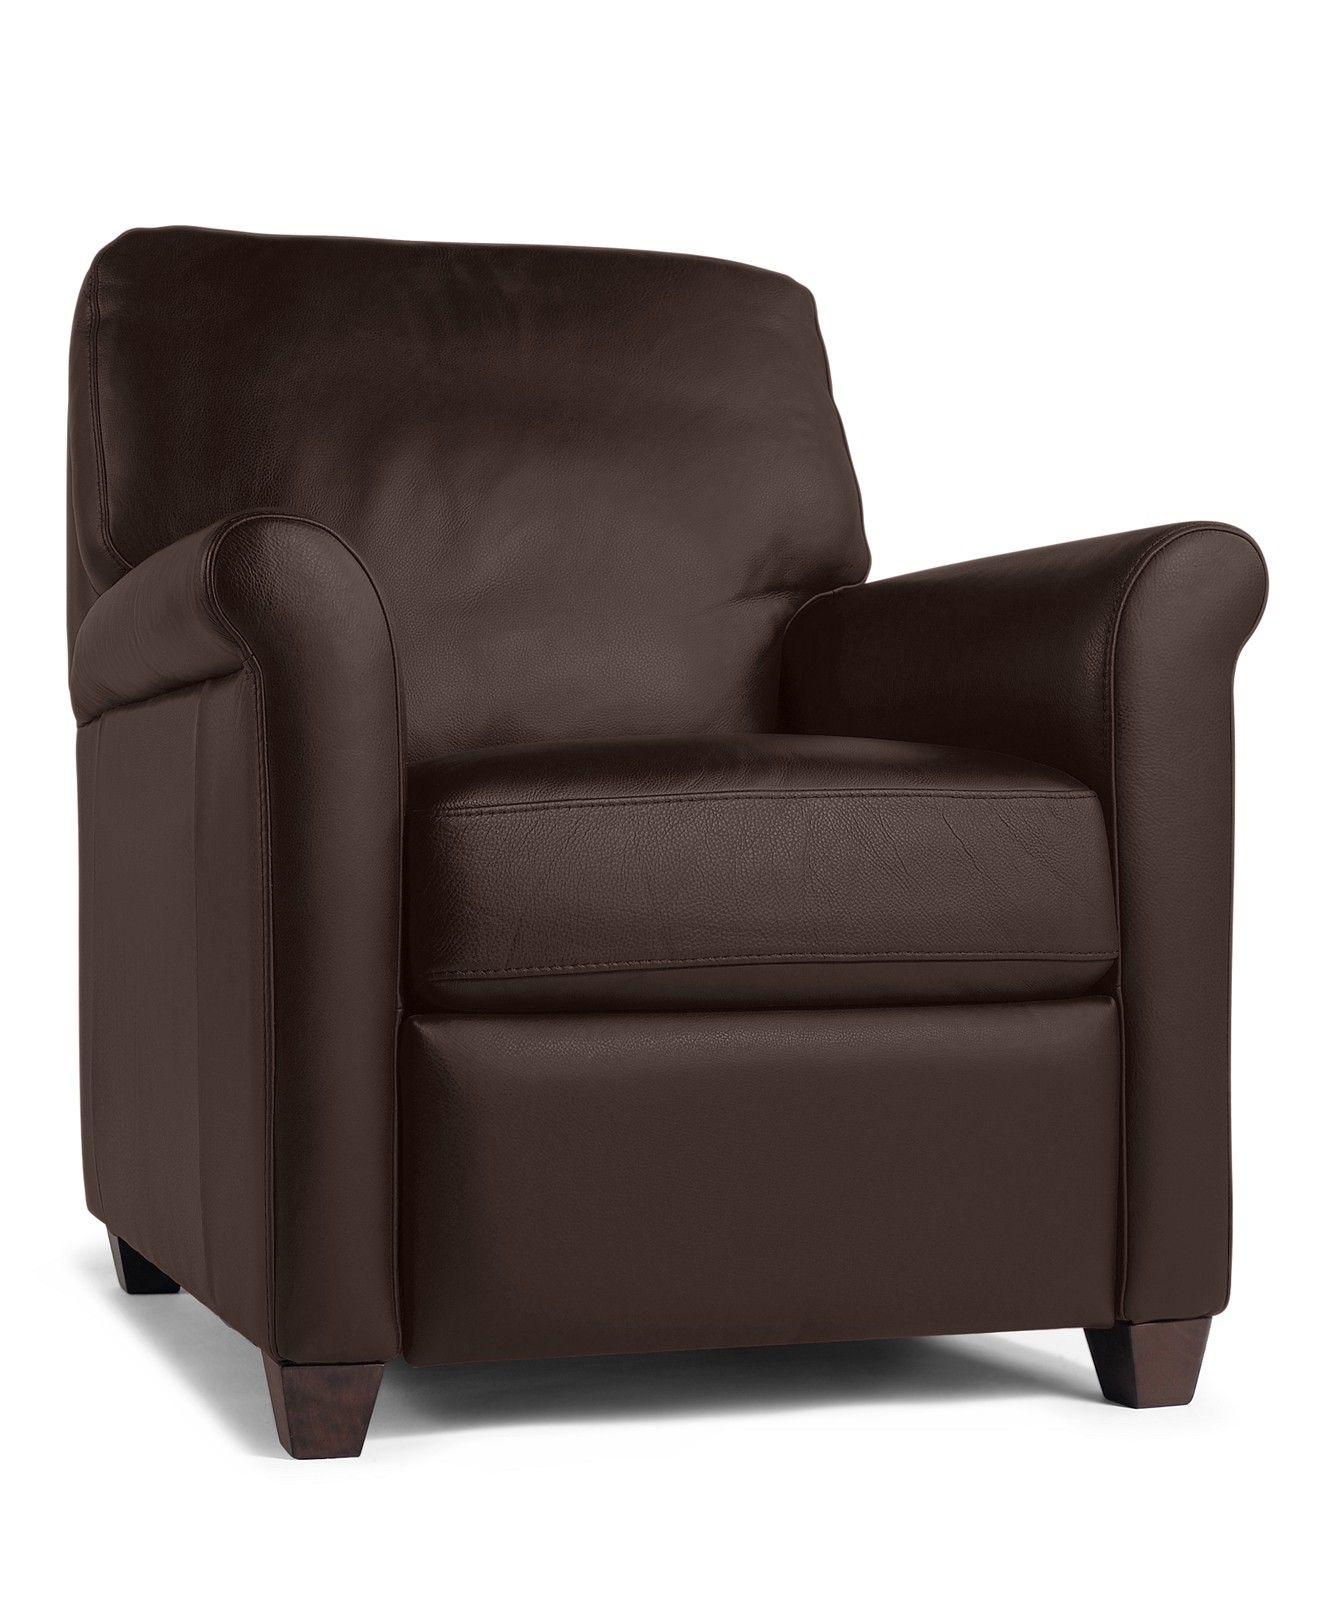 Pleasant Pavia Leather Club Recliner Chair Chairs Recliners Inzonedesignstudio Interior Chair Design Inzonedesignstudiocom